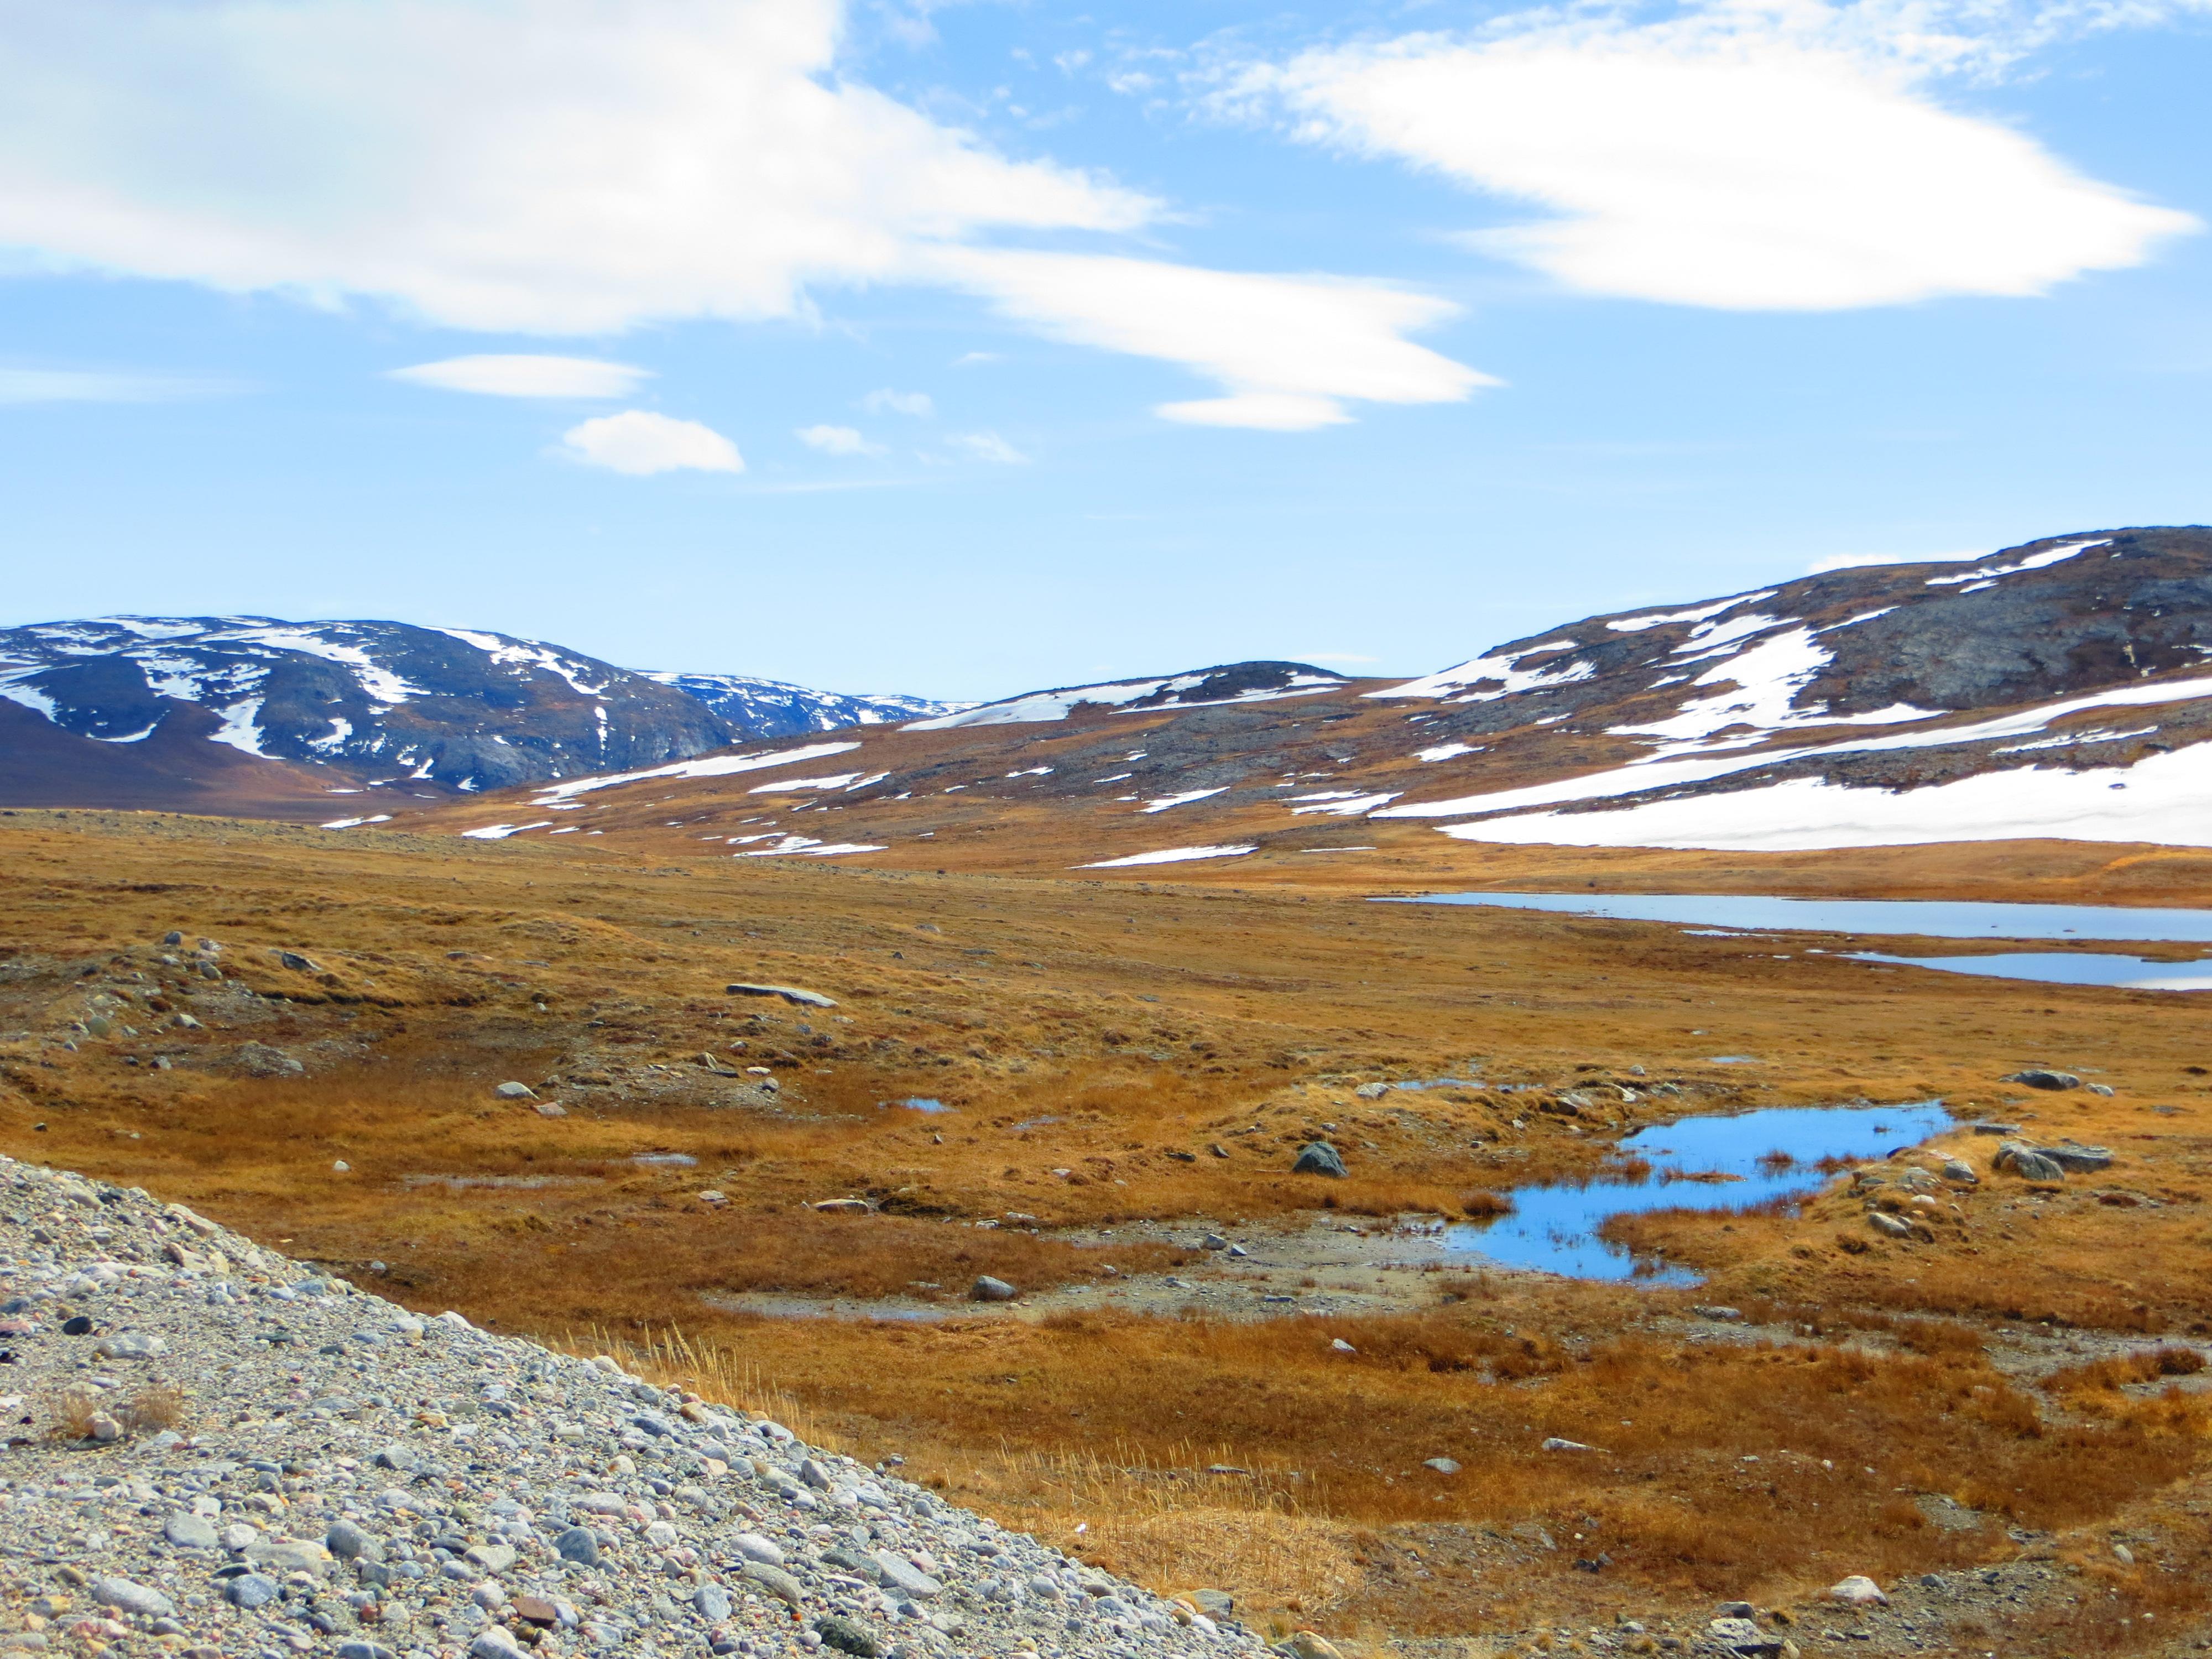 Paysage du grand nord qu b cois le bio coblogue for Agence paysage nord